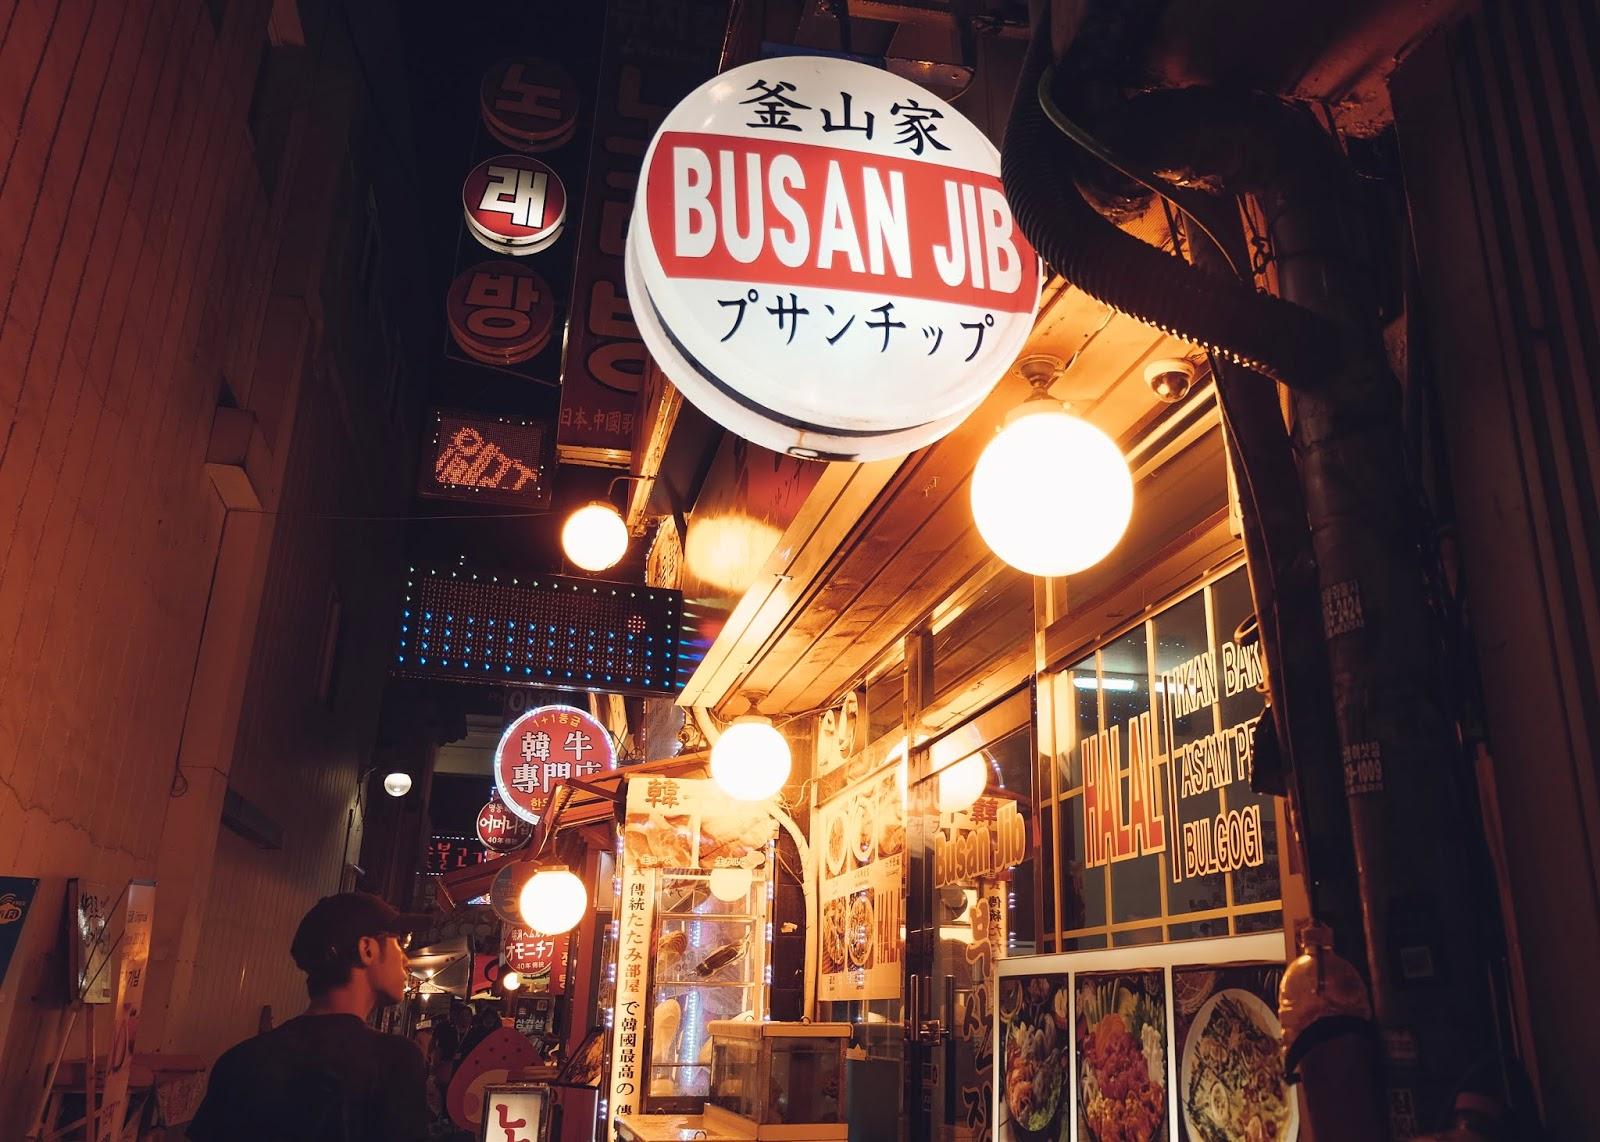 Busan Jib Restaurant Seoul Korea Curitan Aqalili